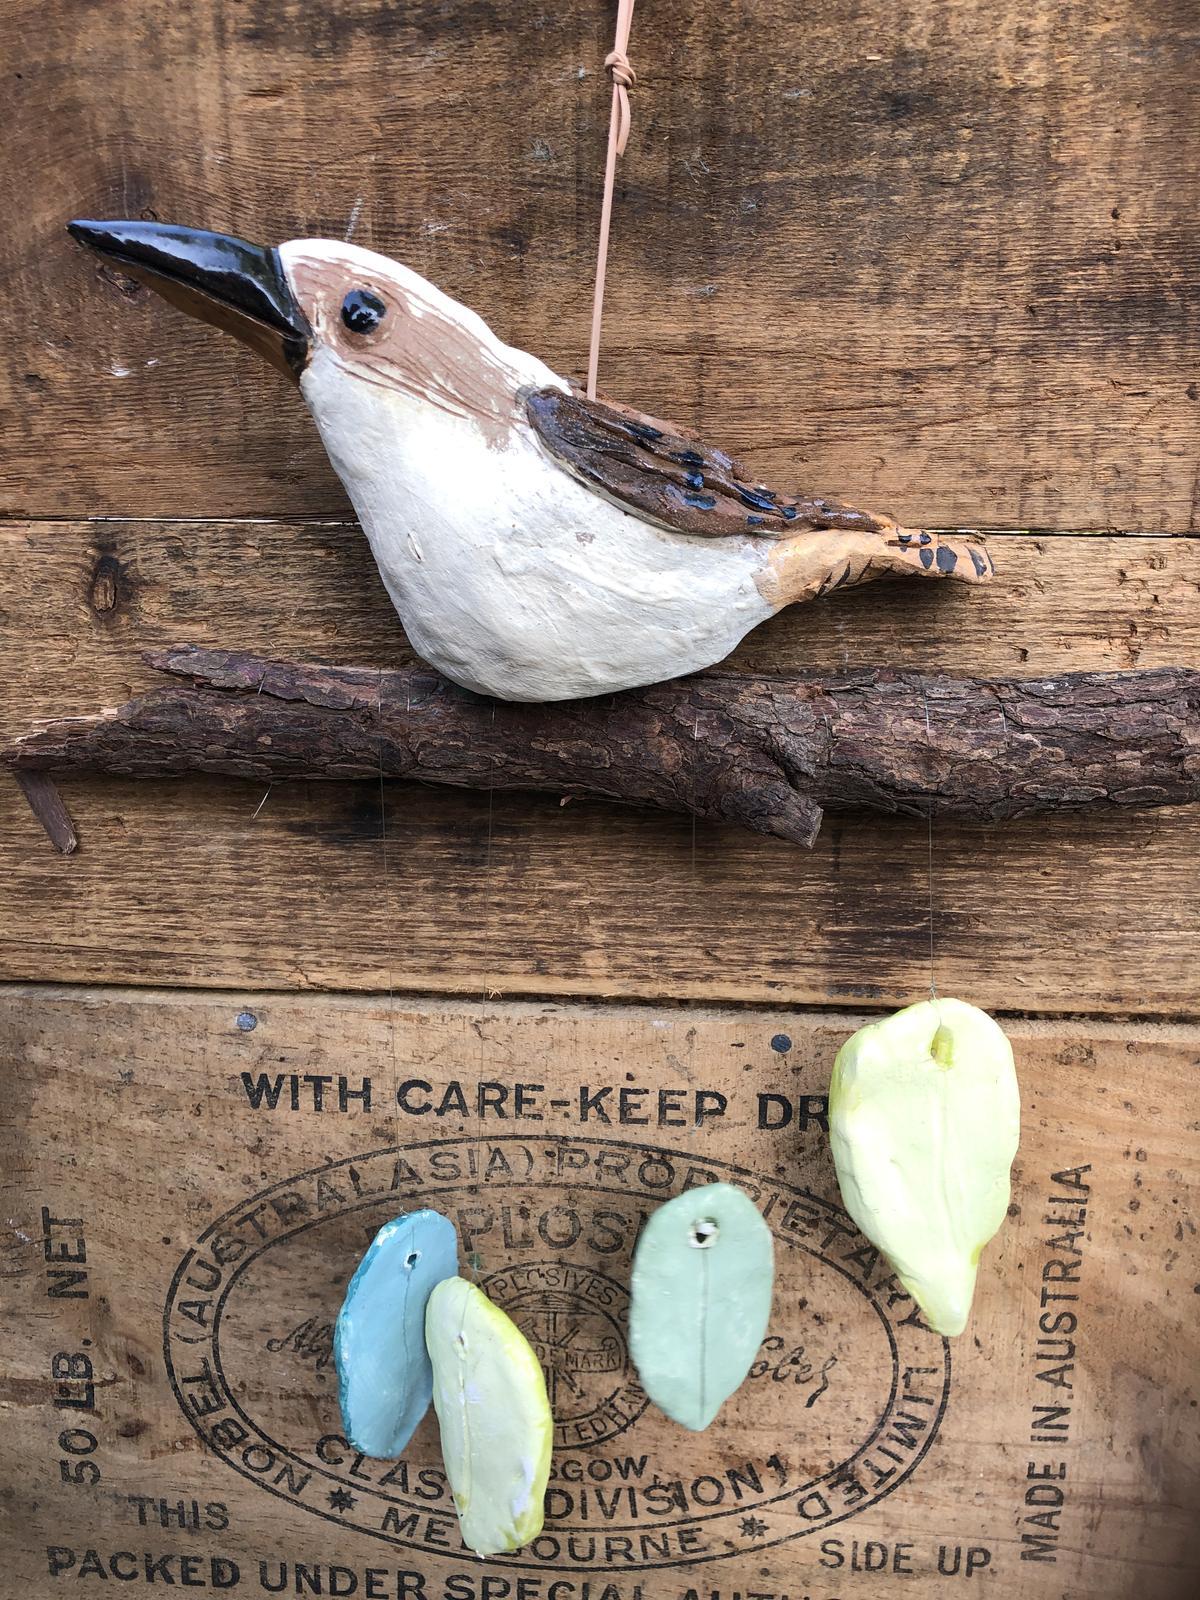 Kookaburra Chime